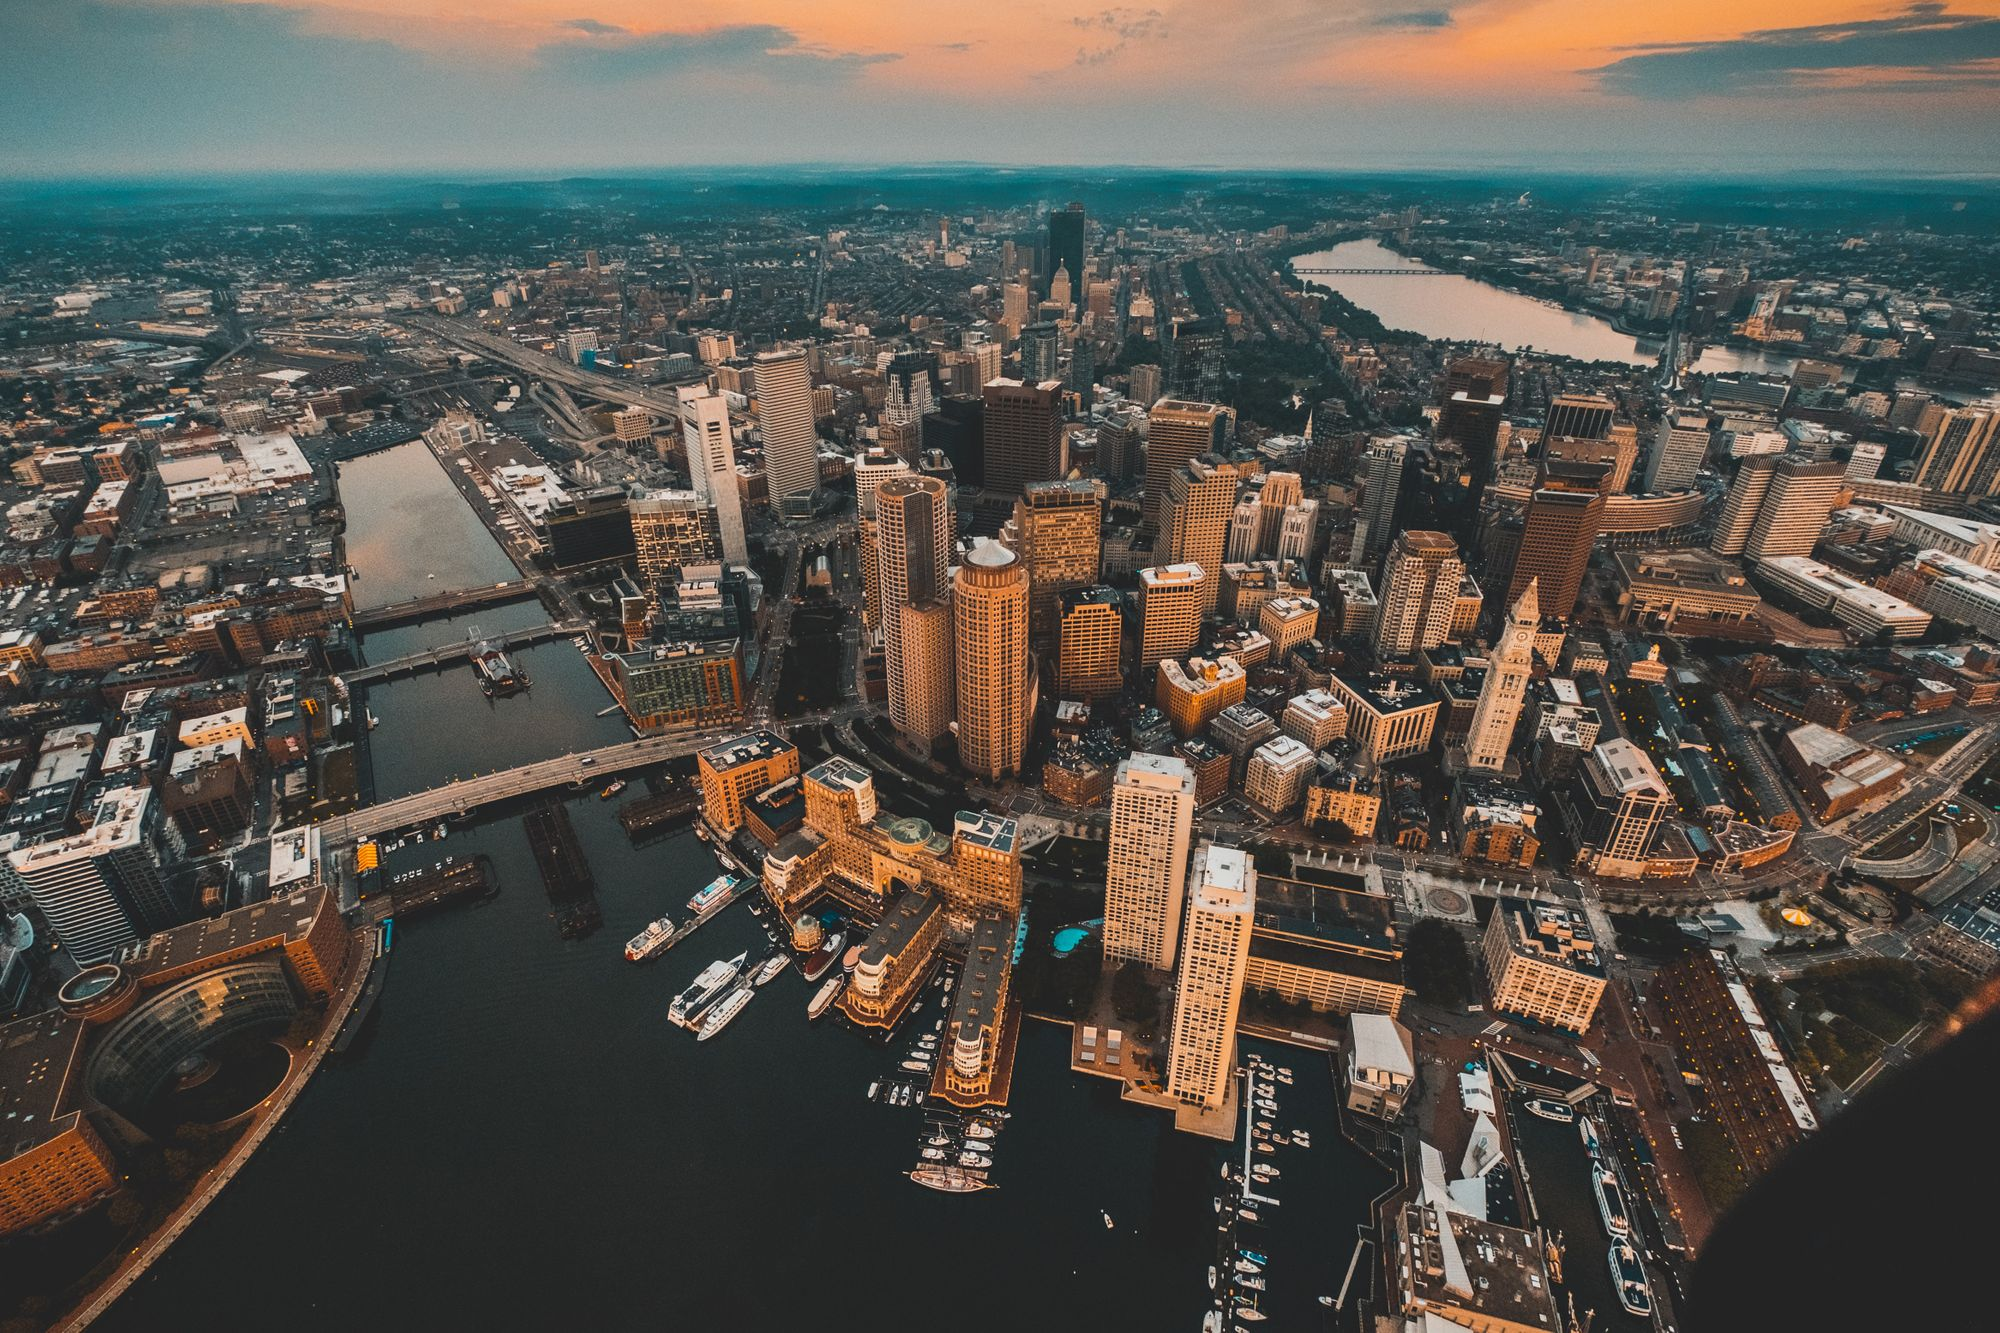 Photo of the Boston City Skyline